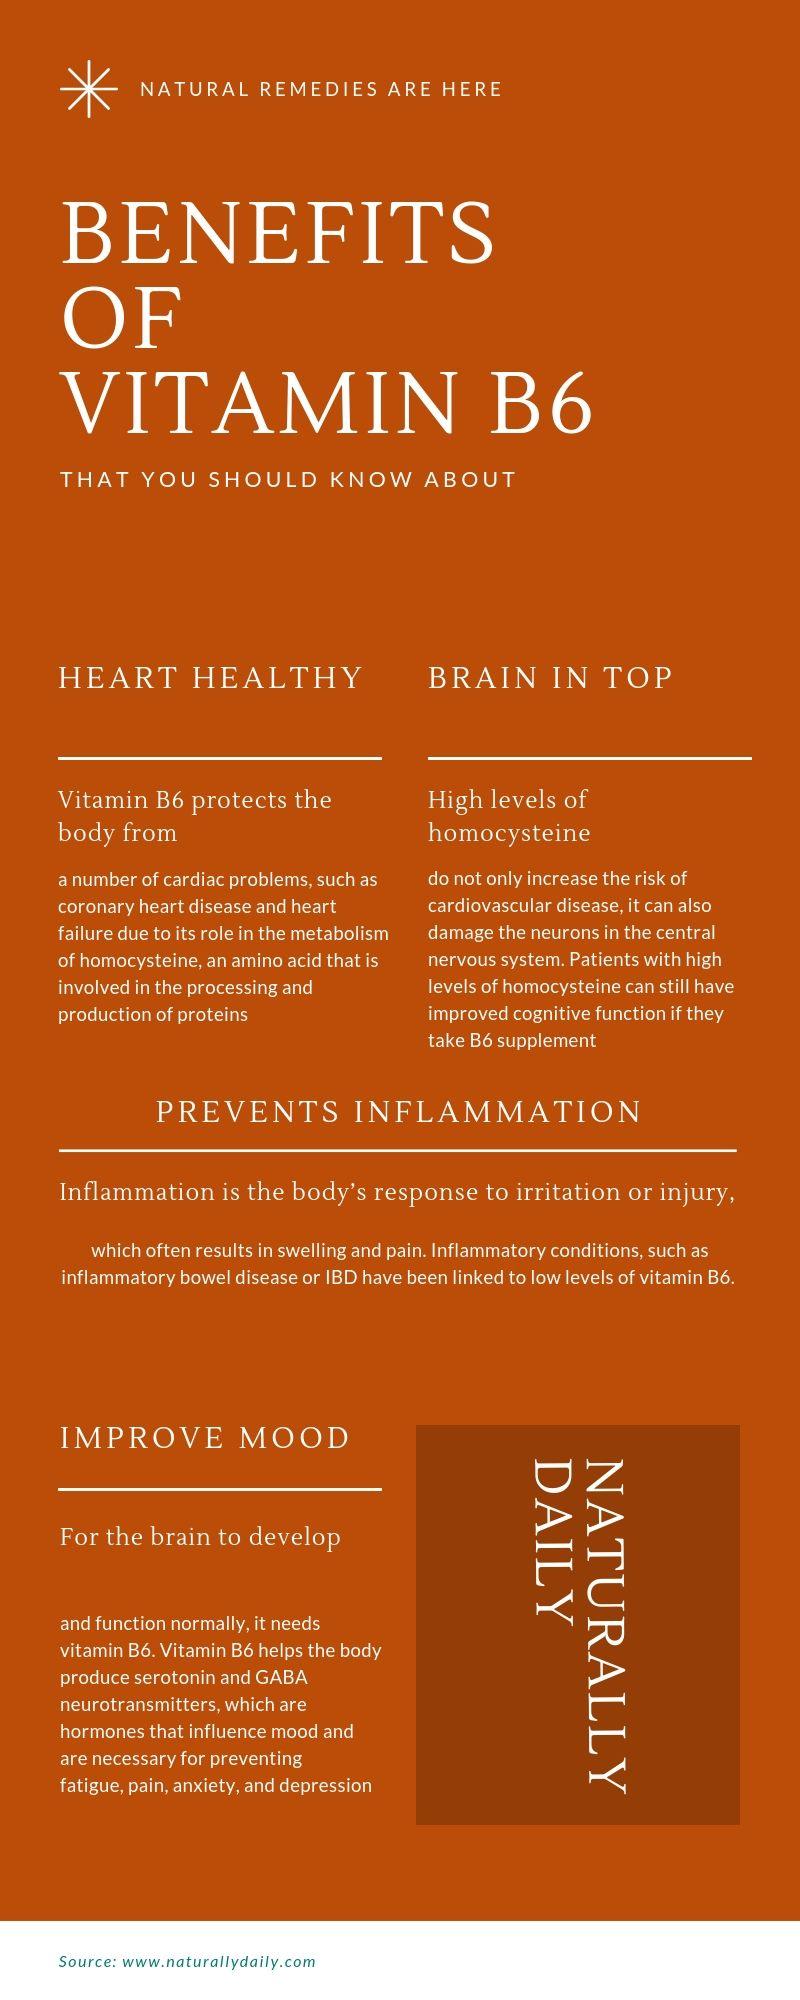 Benefits Of Vitamin B6 Vitamins B6 Vitamin Benefits Vitamin B6